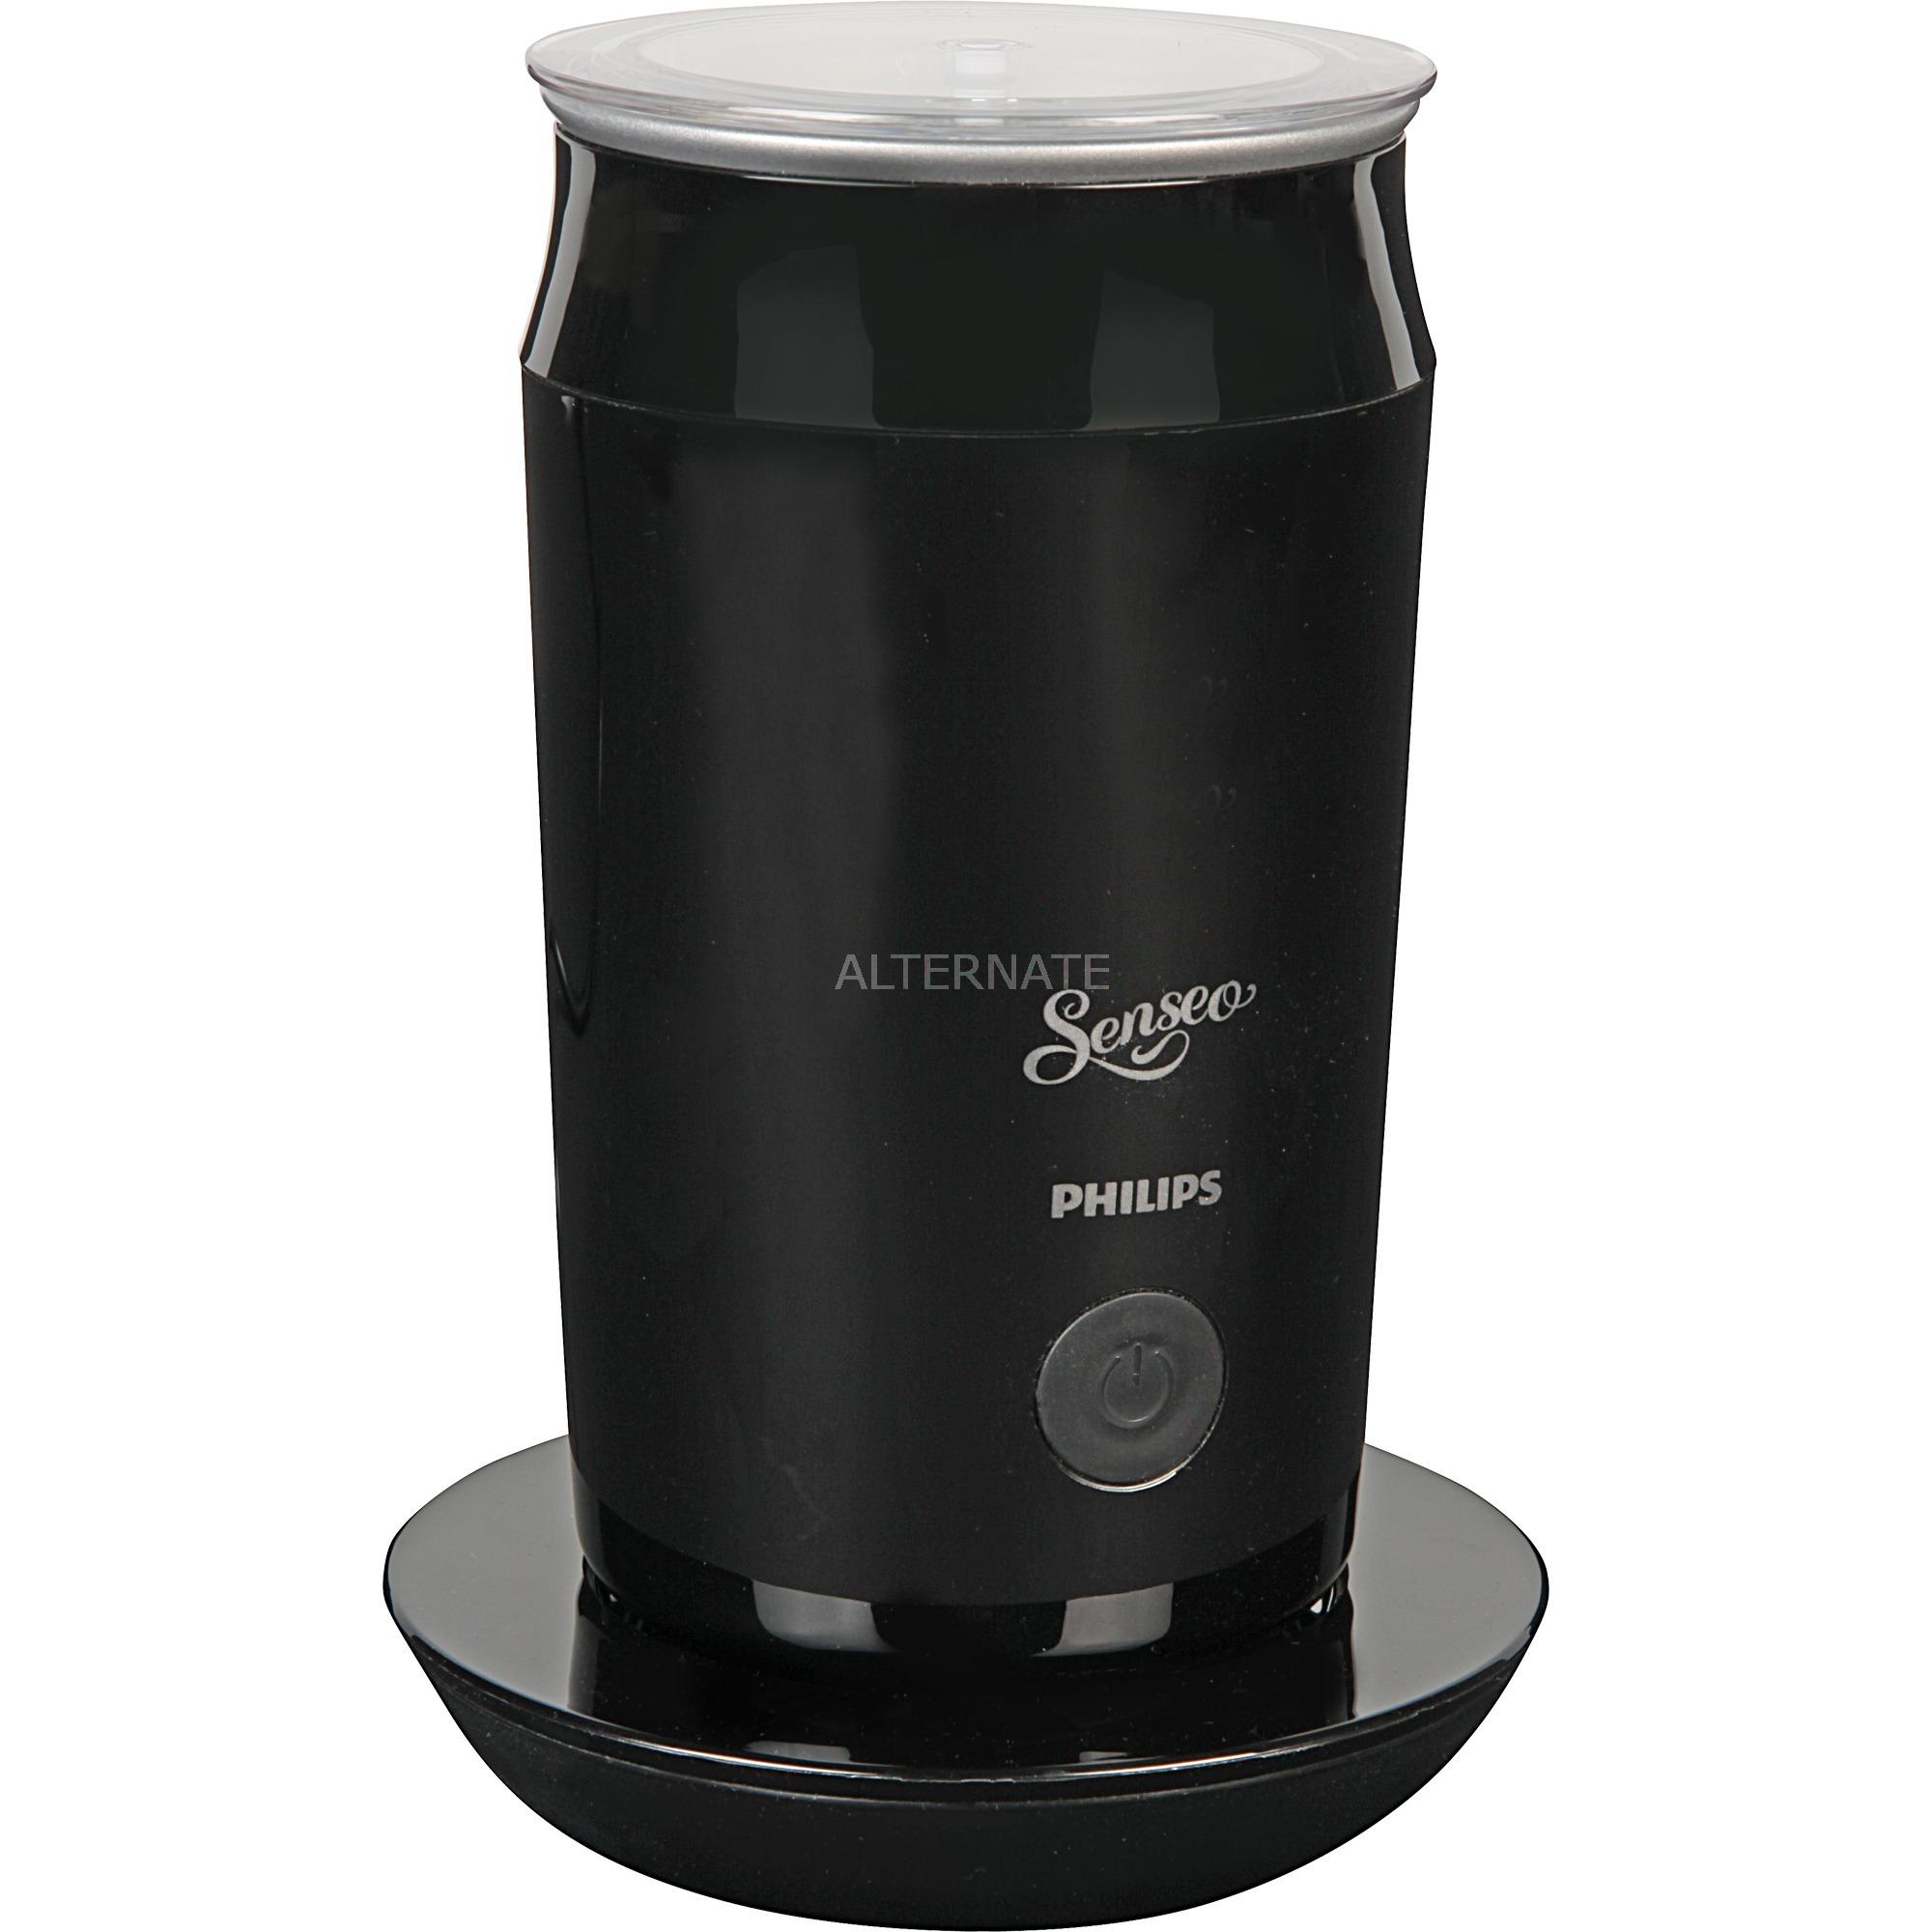 CA6500/60 espumador para leche Negro, Espumador de leche